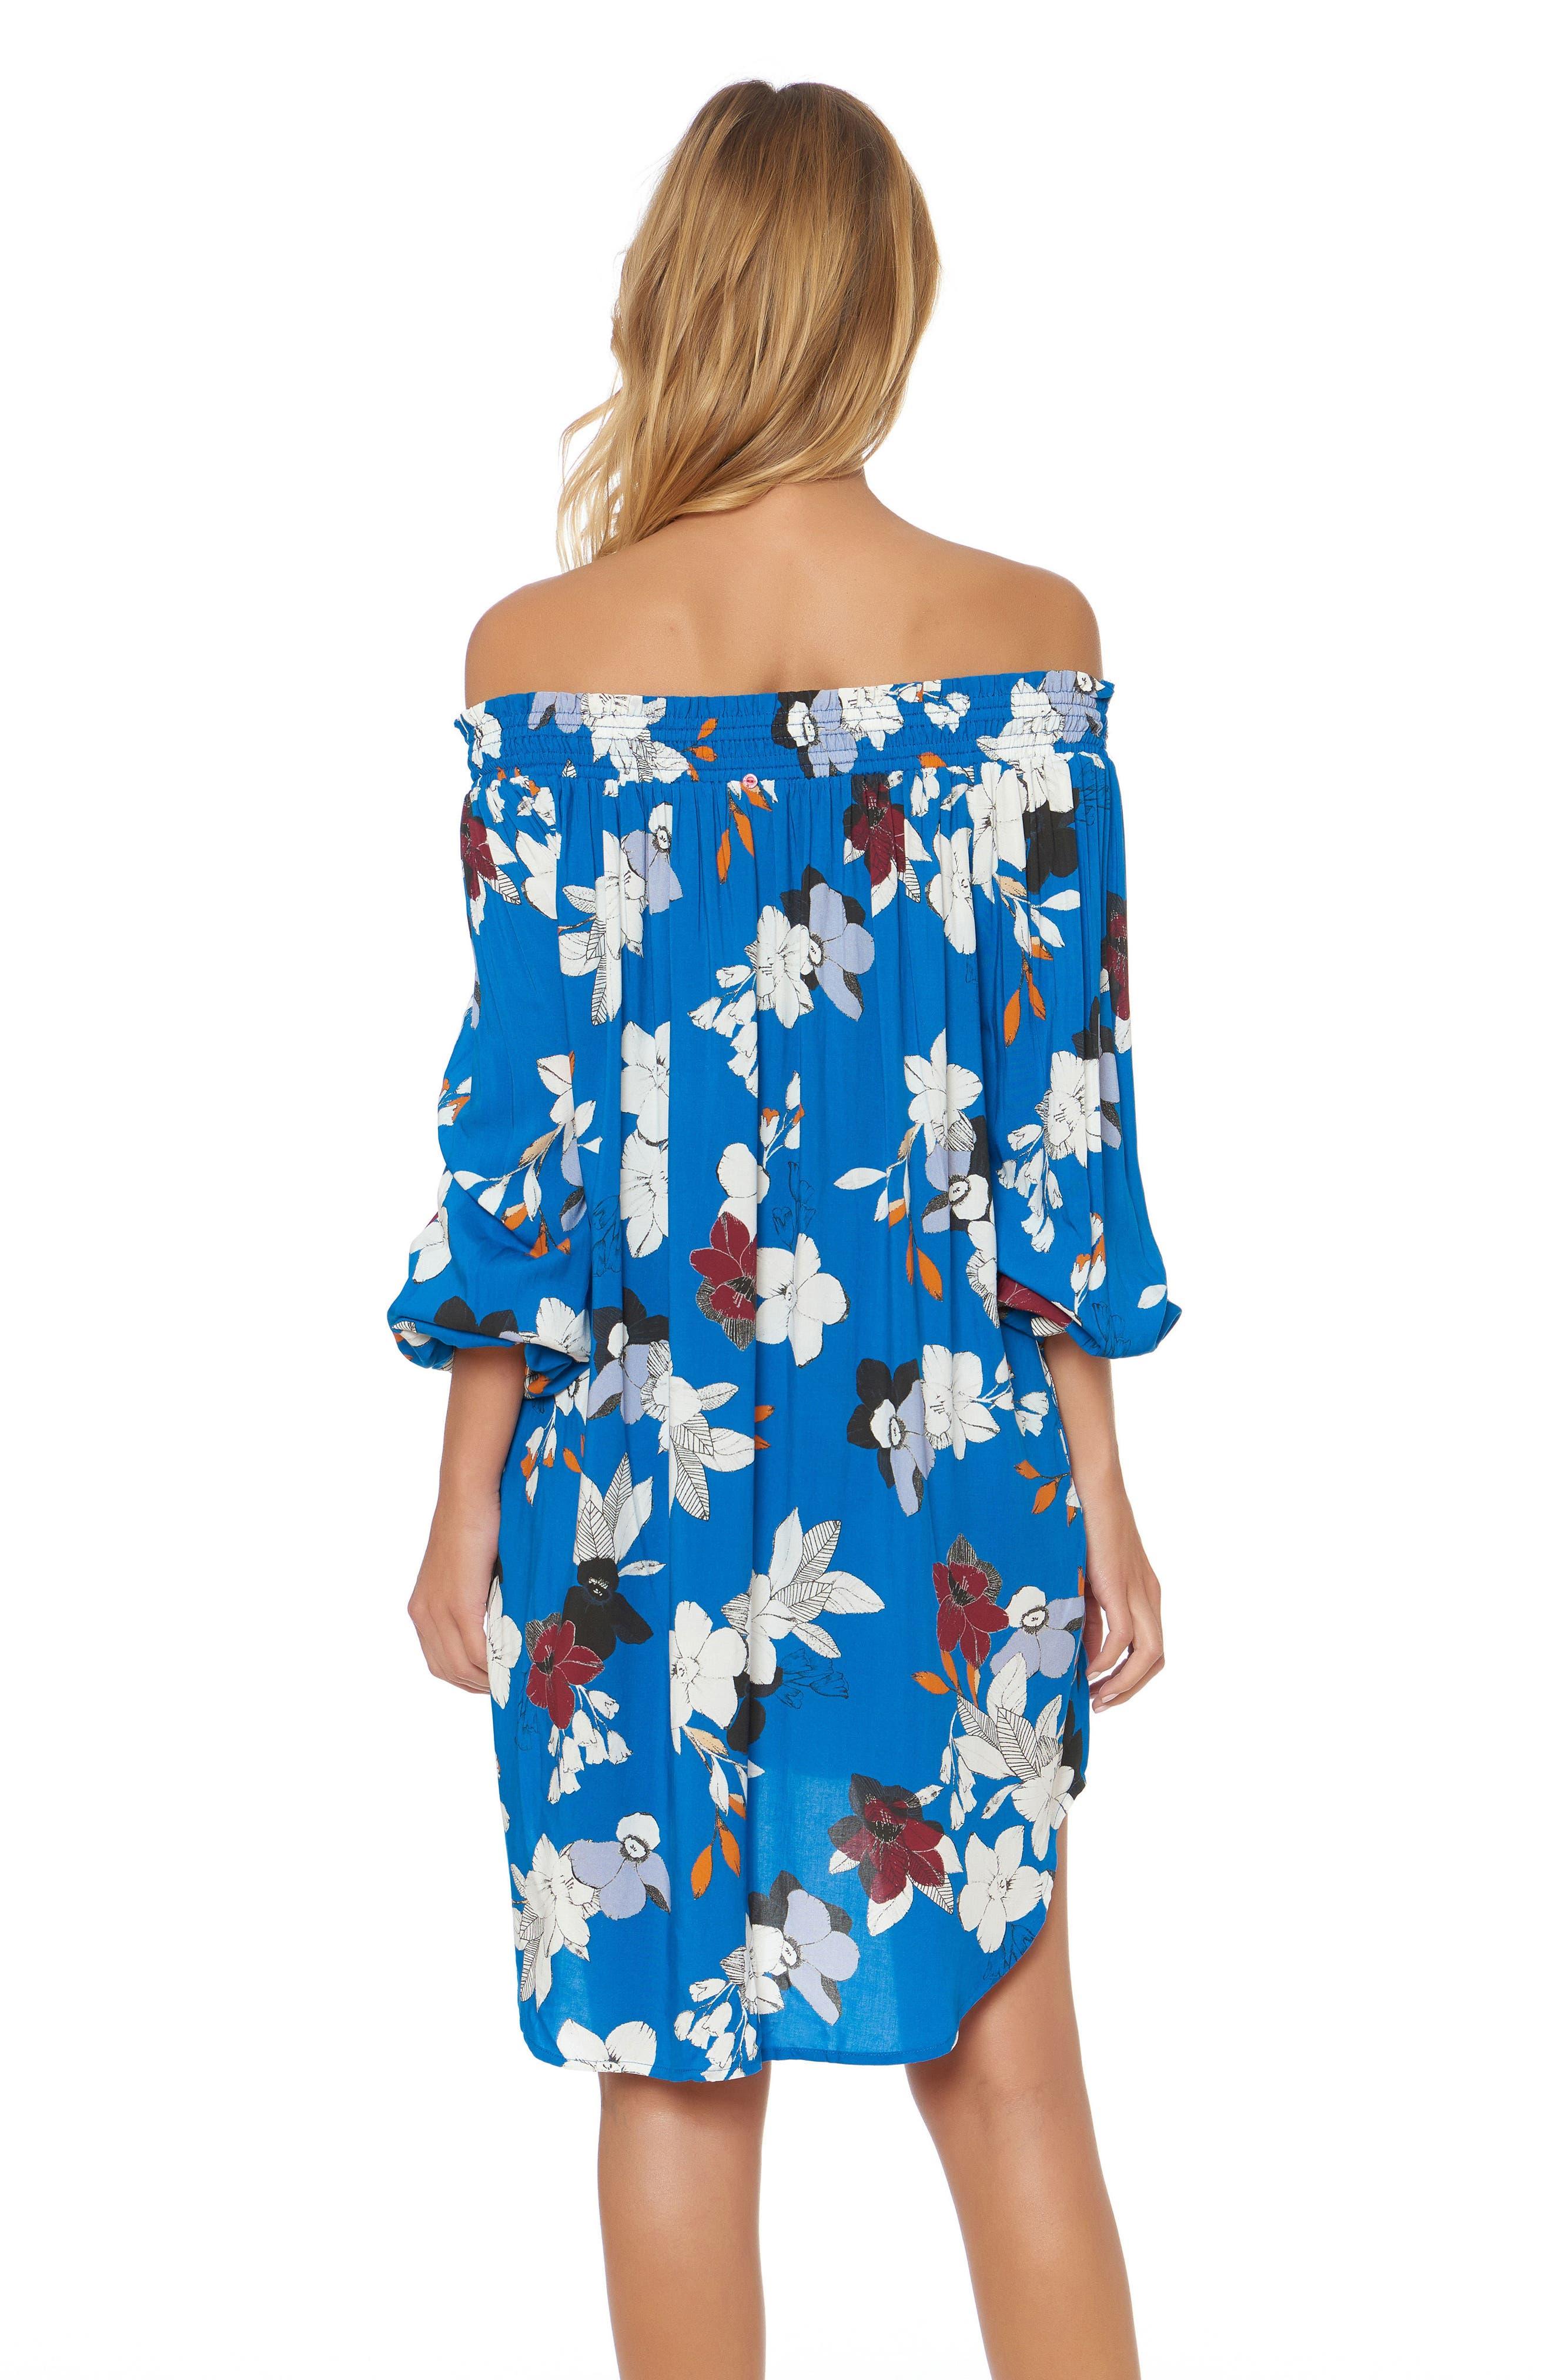 Floral Off the Shoulder Cover-Up Dress,                             Alternate thumbnail 4, color,                             VISION